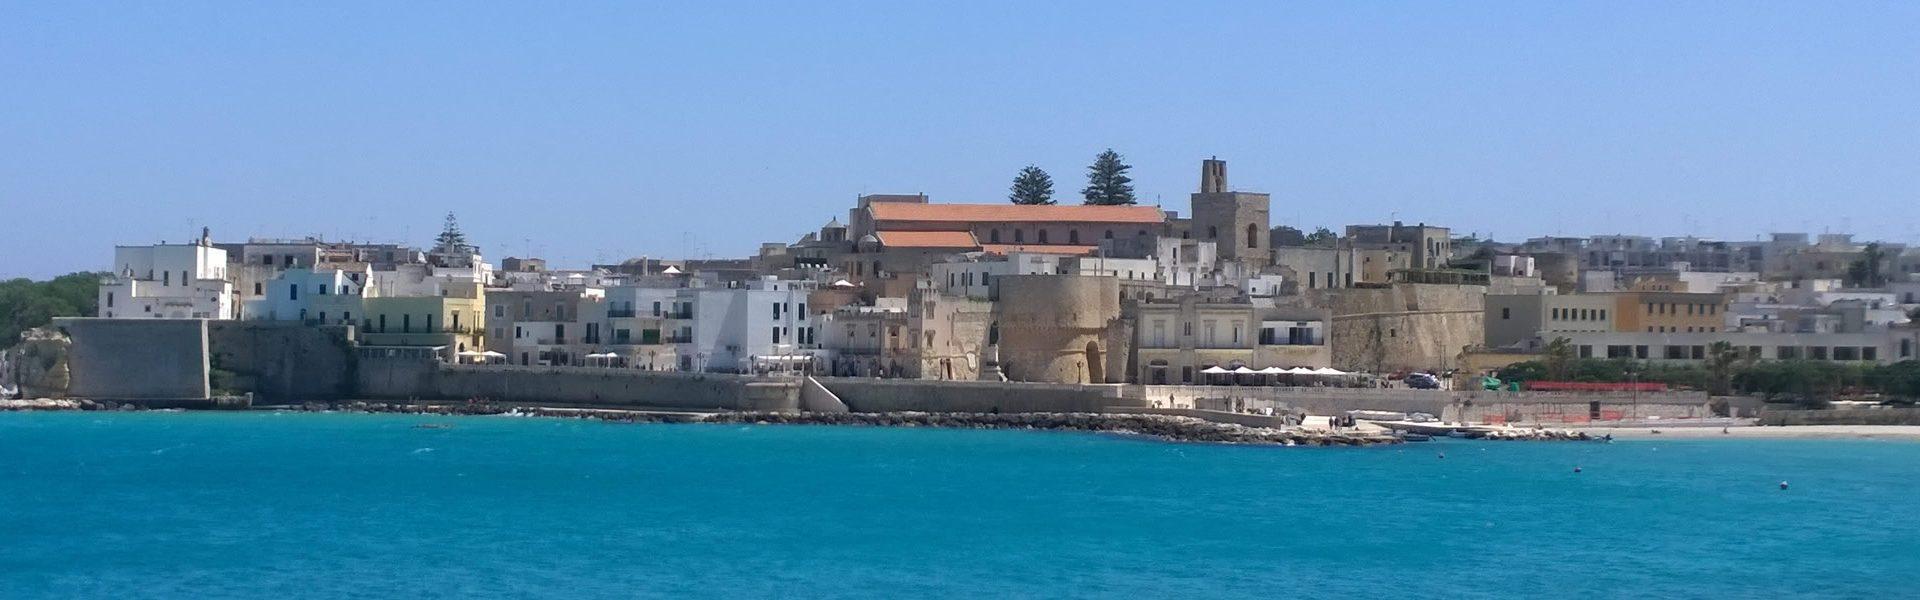 B&B Camere d'Aragona | B&B Otranto